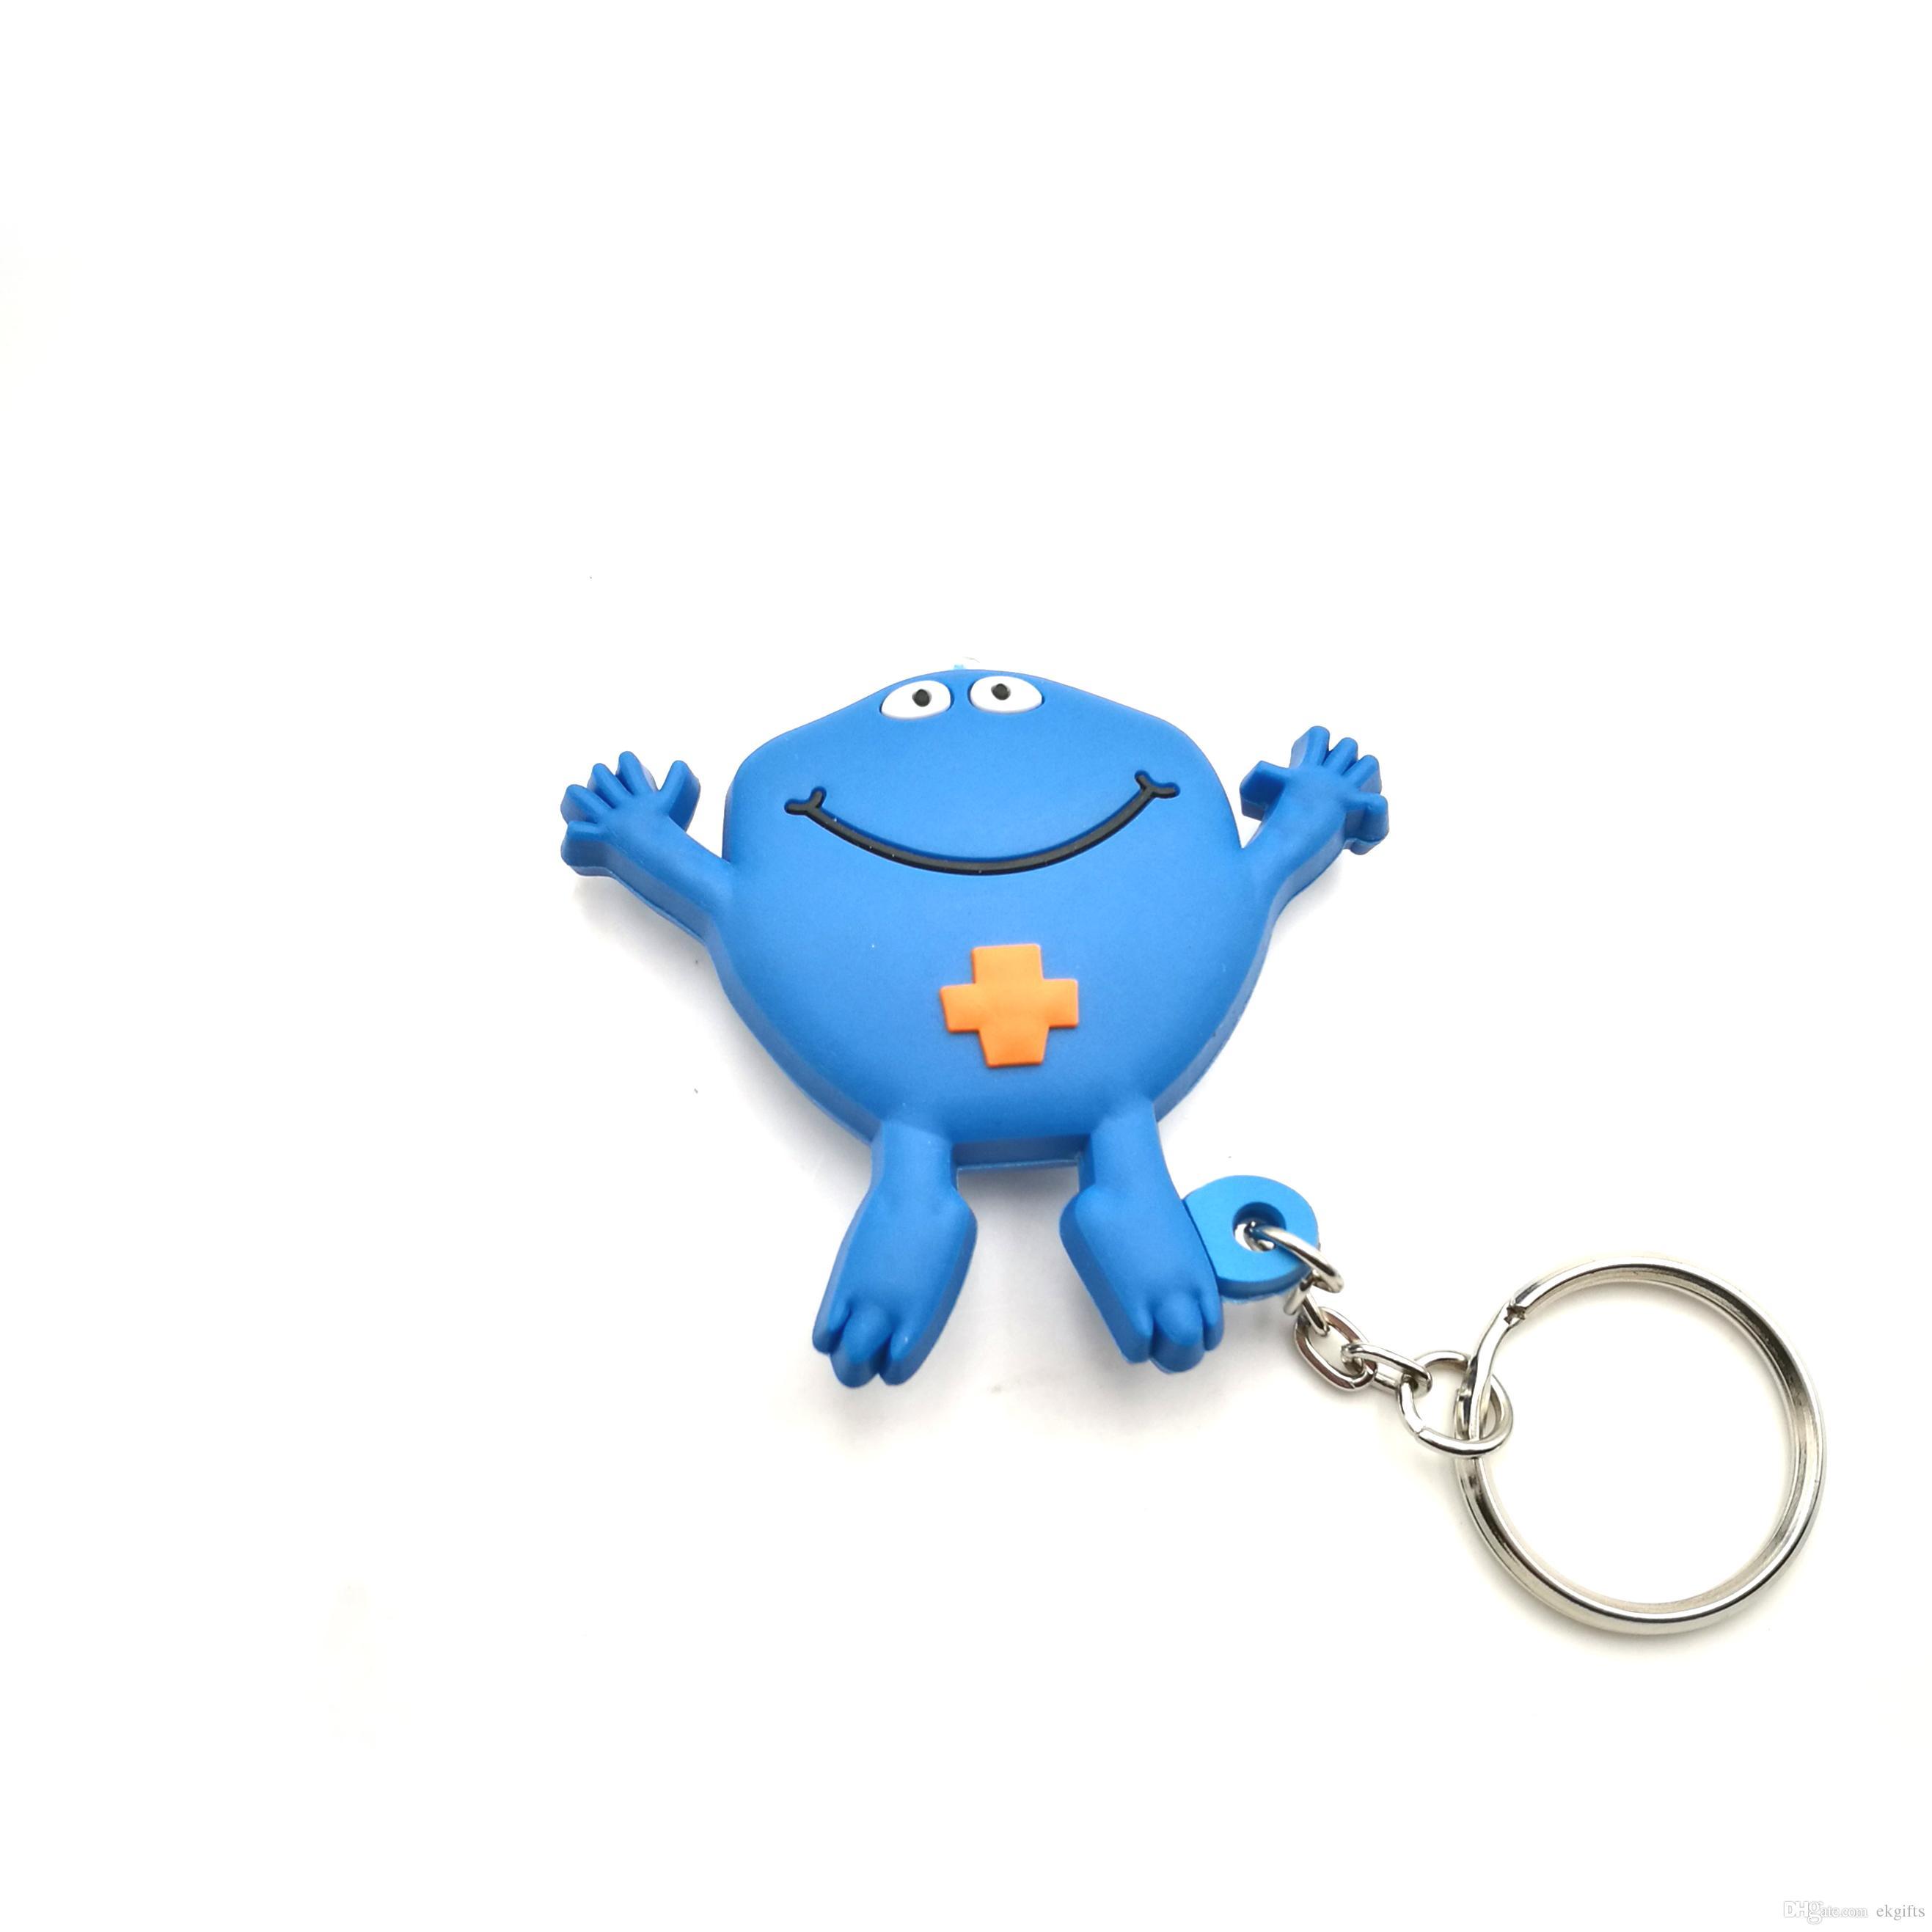 China Professional PVC Key Chain Gift Maker Custom Made Plastic LED Light  Keyring Cheap Promotional Keychains Kingdom Hearts Keychain Promotional  Keyrings ... bc27988c3